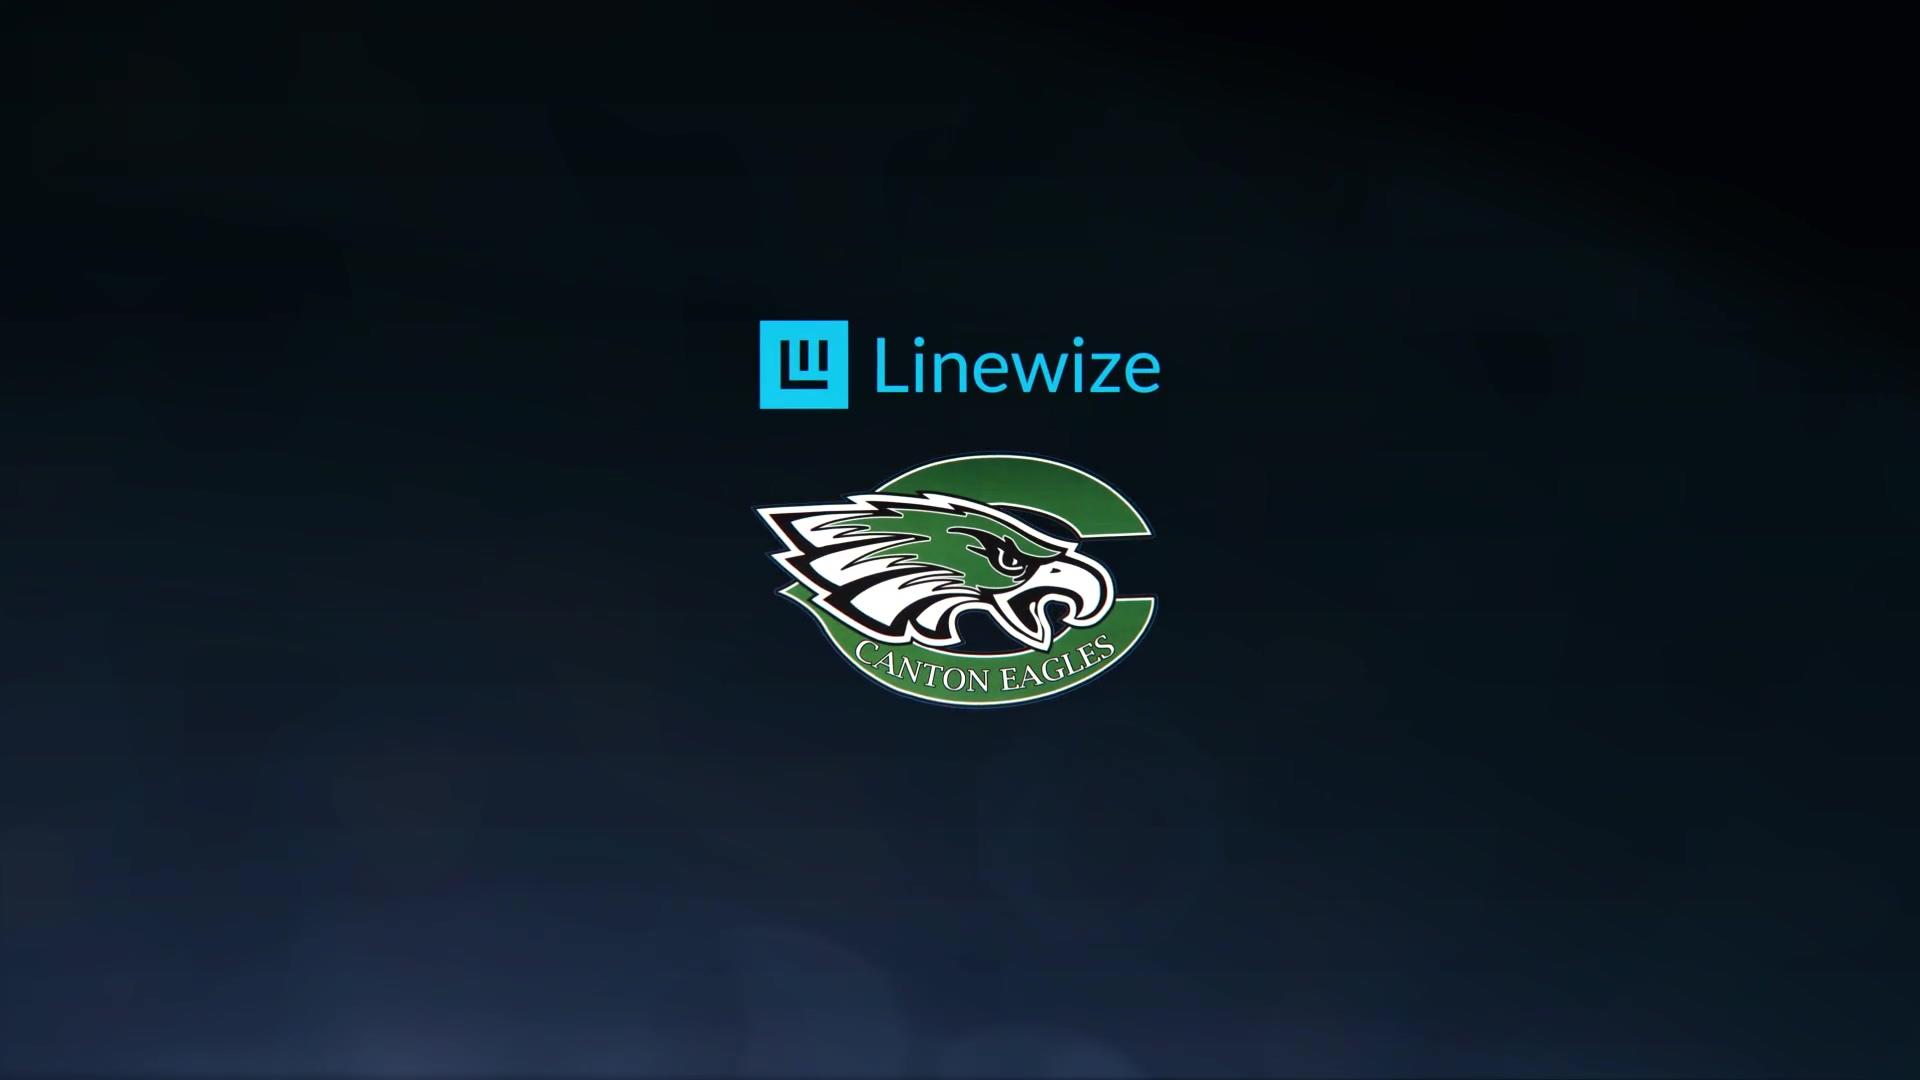 02-05-2021 Linewize-Customer Testimonial v2 (1)